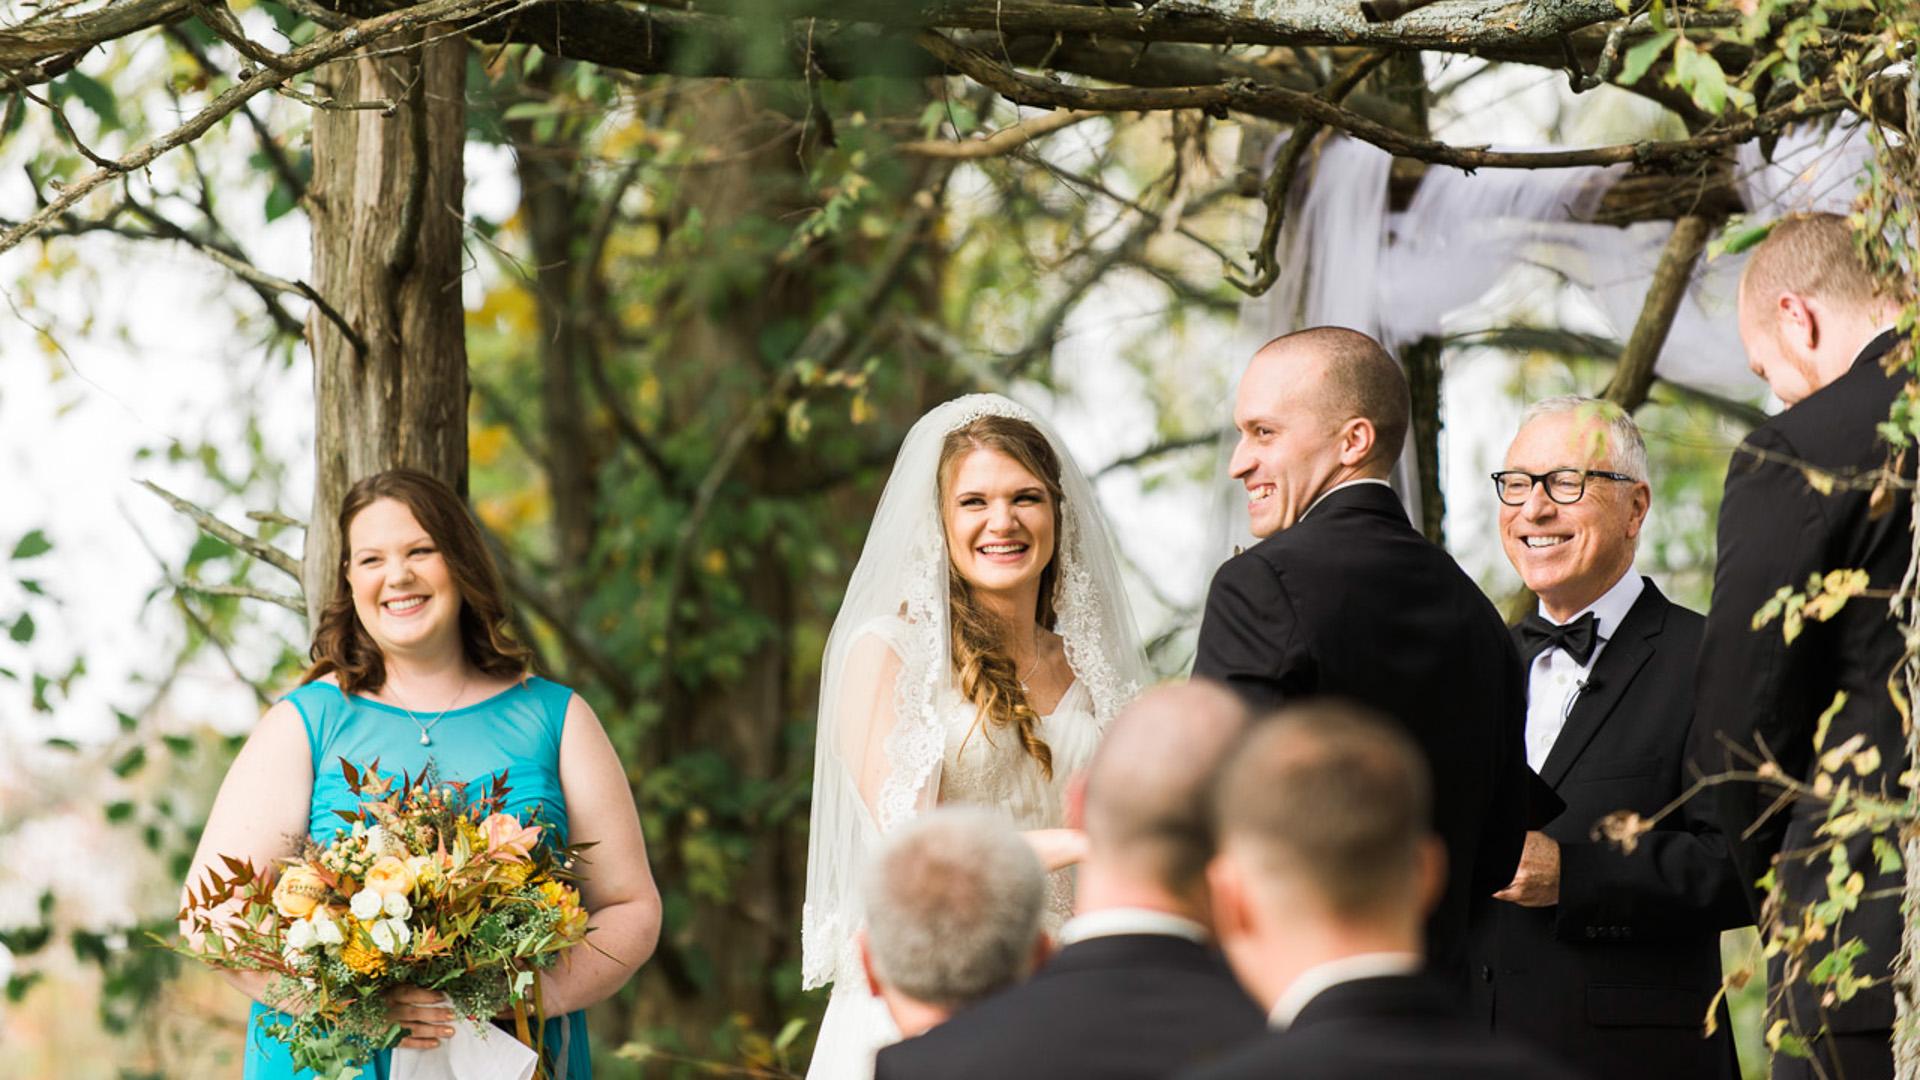 JCM-weddings-34.jpg